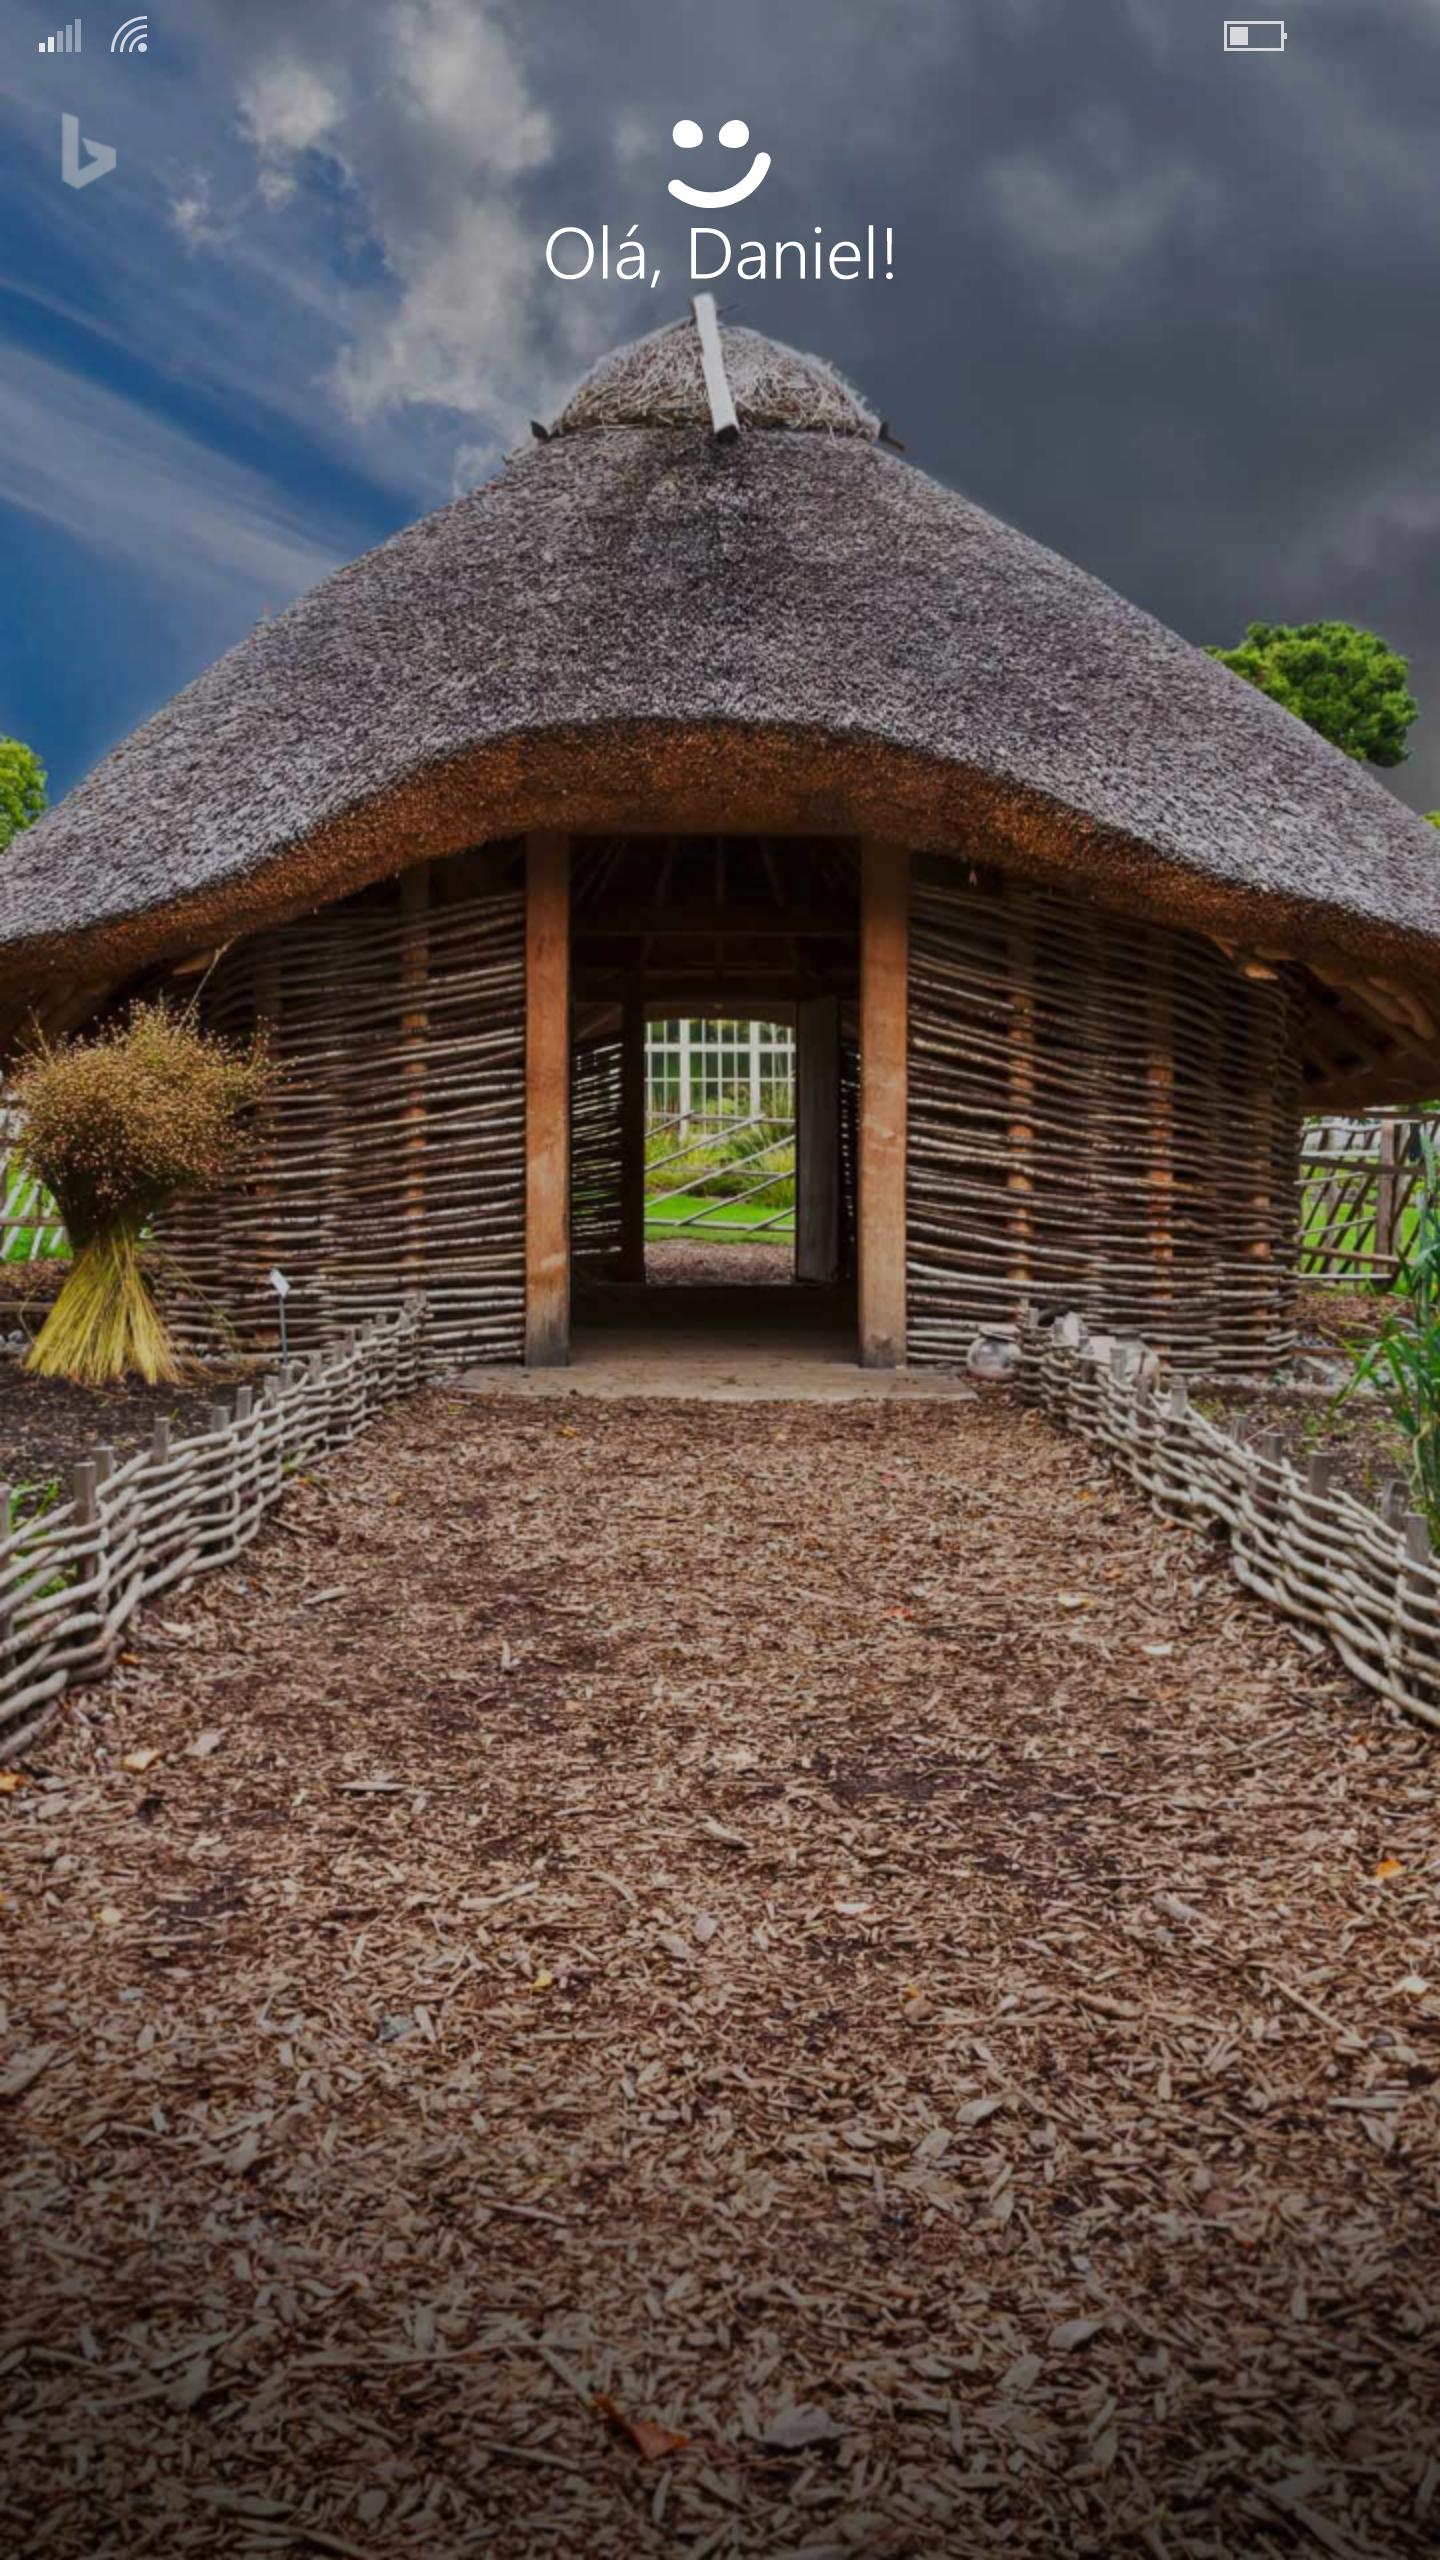 Replica of a Viking home in Dublin National Botanic Gardens, Ireland ...